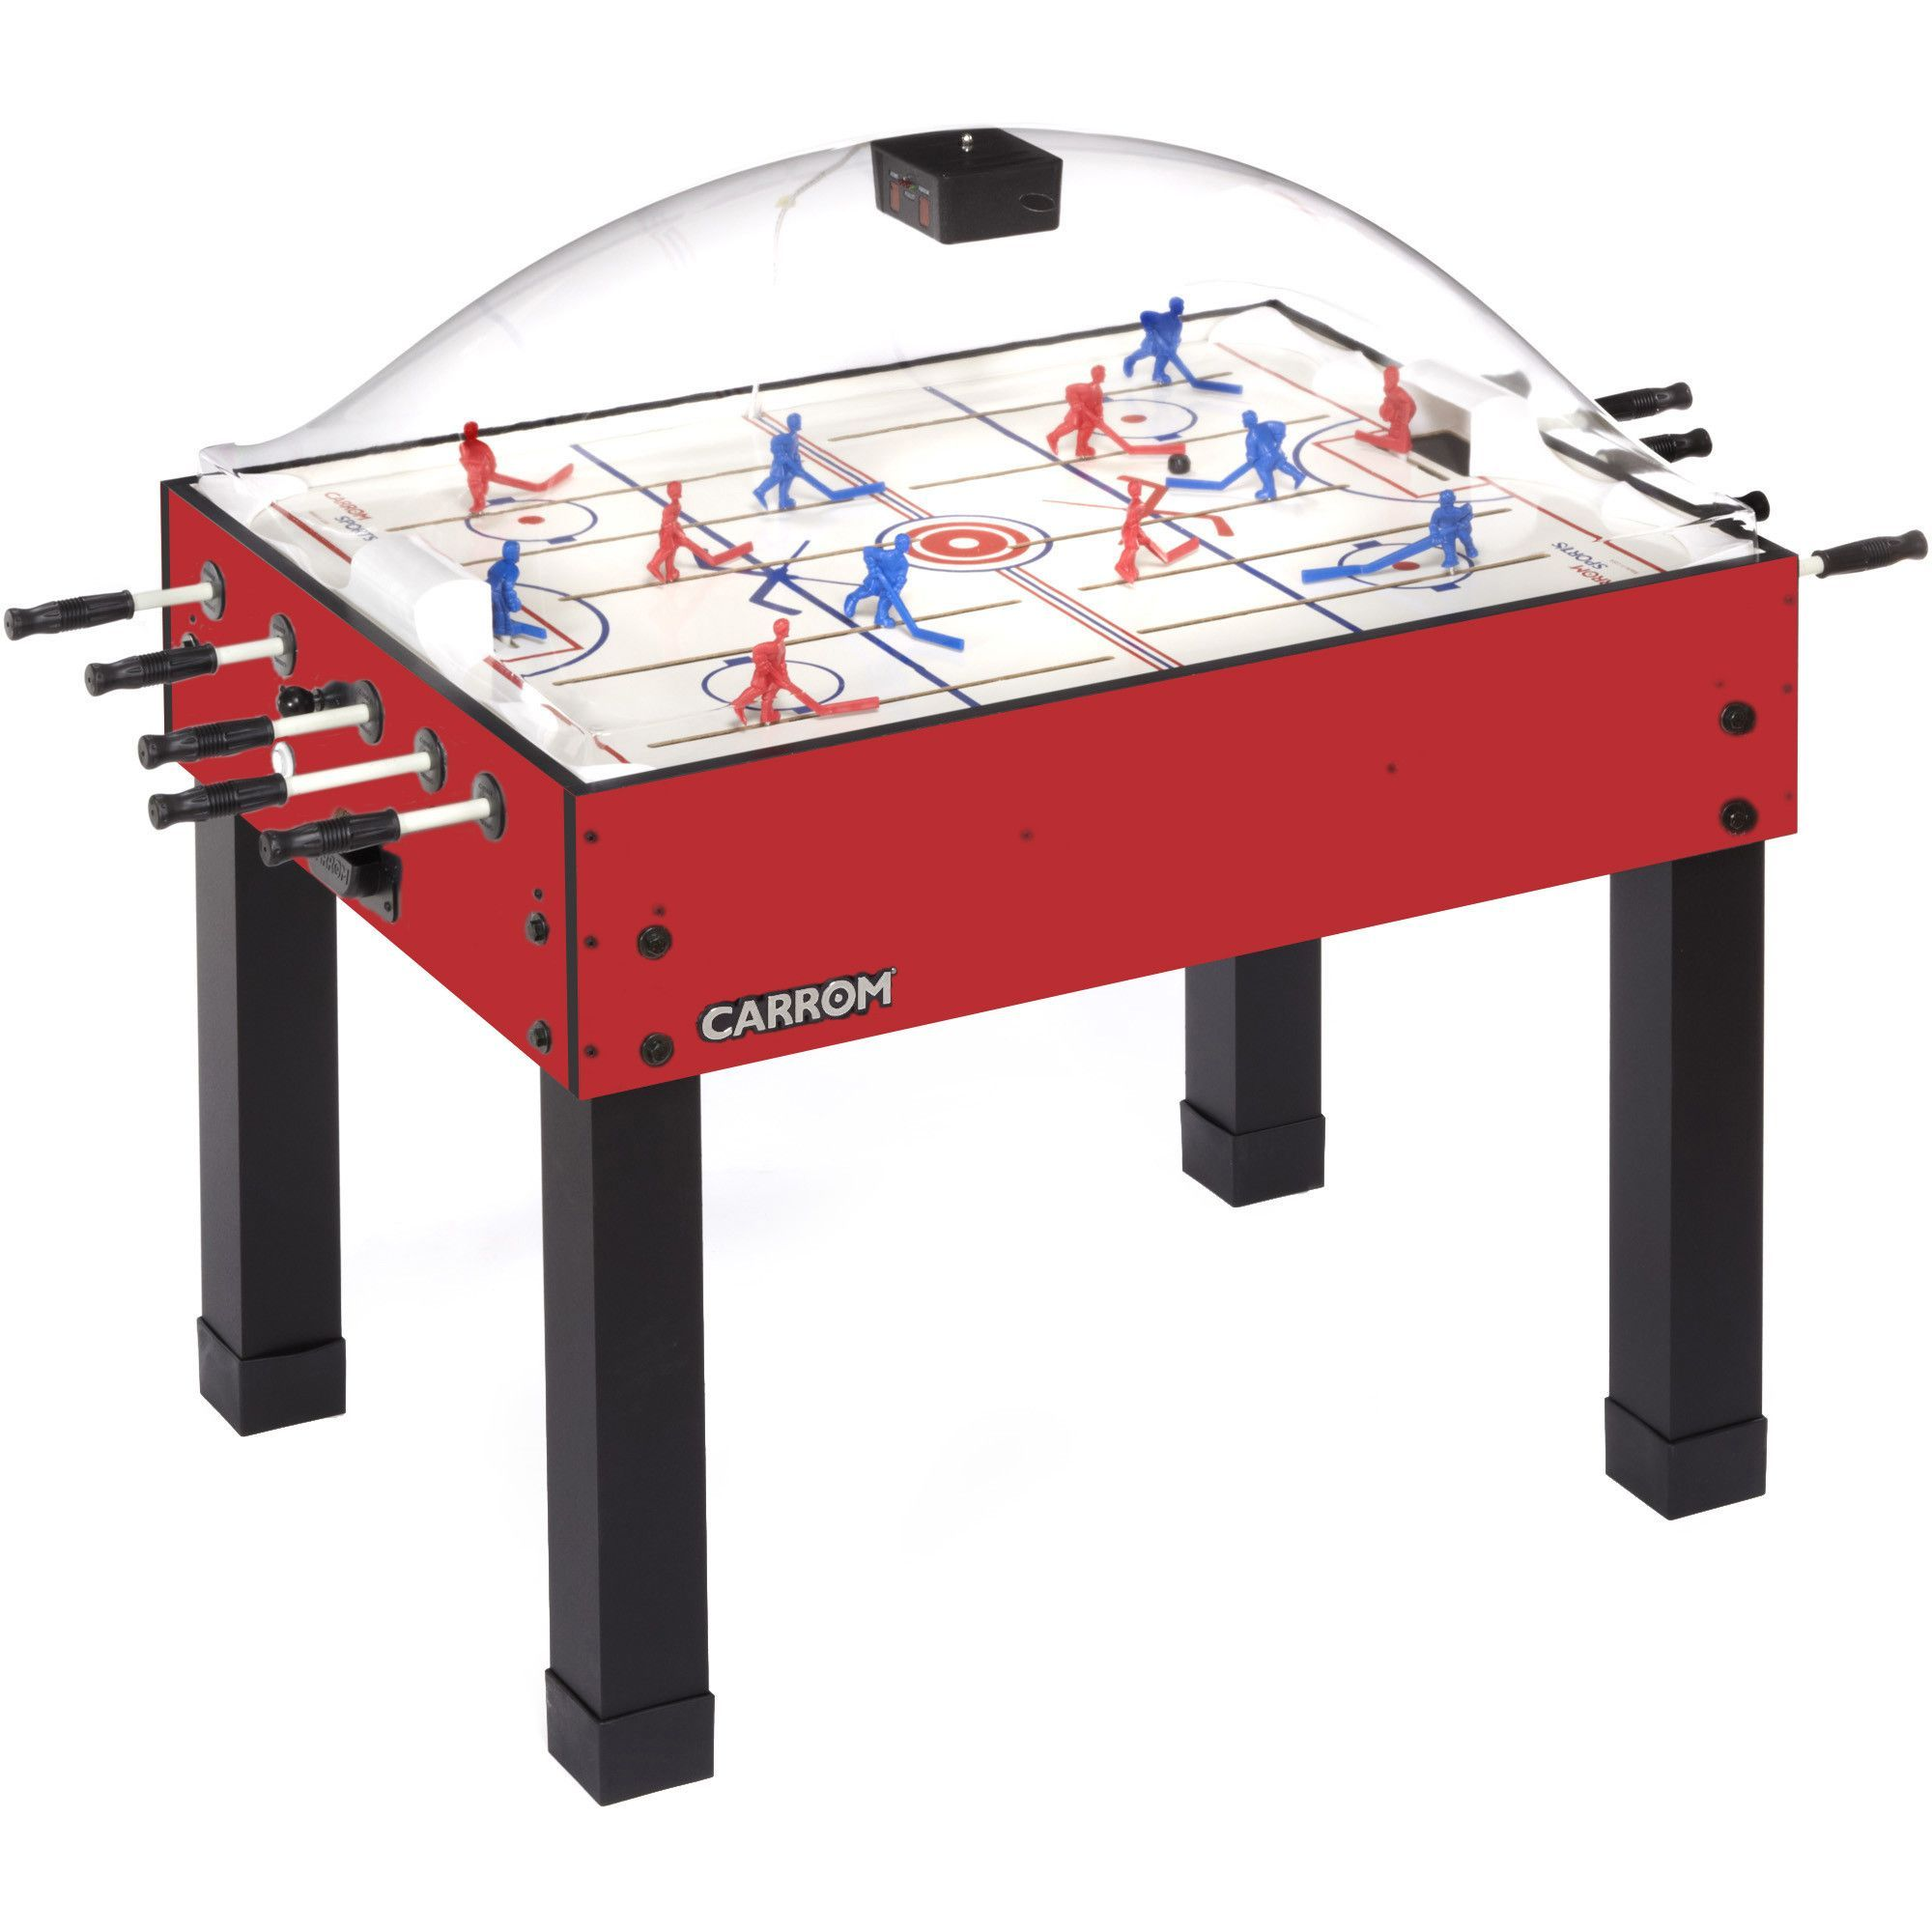 58 Two Player Rod Stick Hockey With Digital Scoreboard Air Hockey Table Hockey Foosball Table